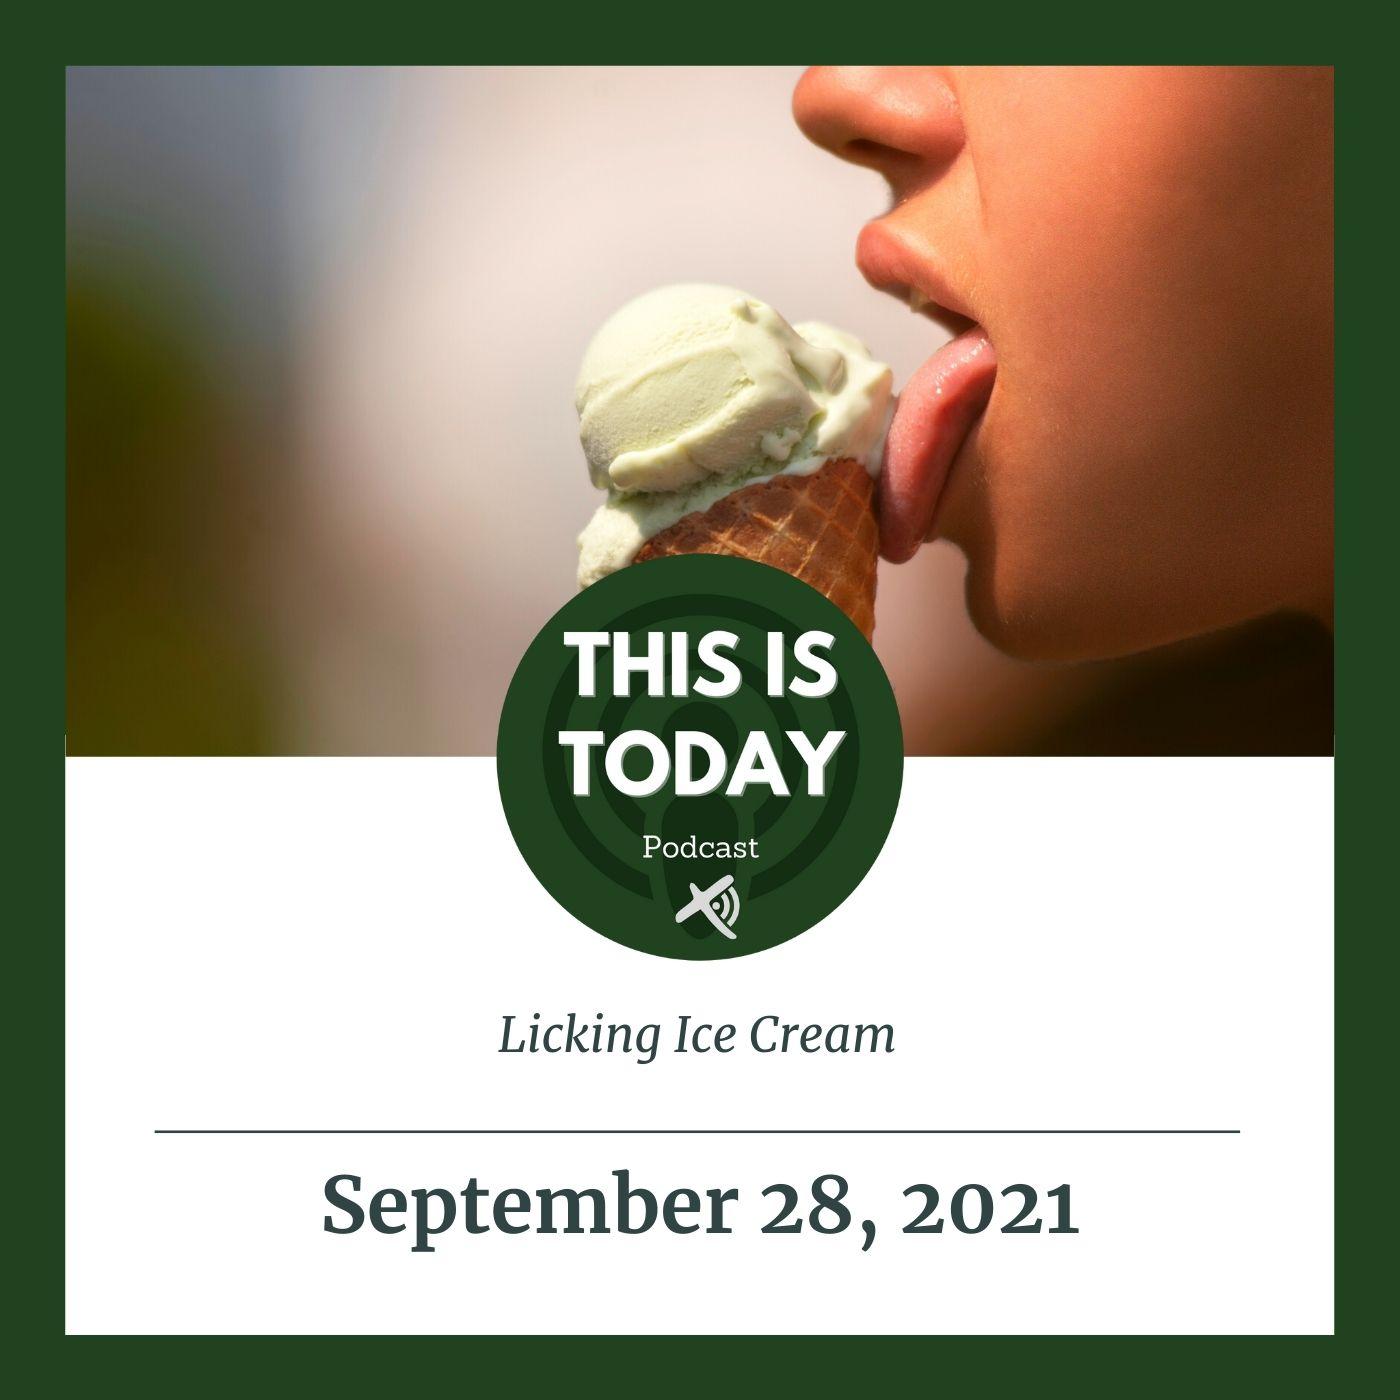 Licking Ice Cream